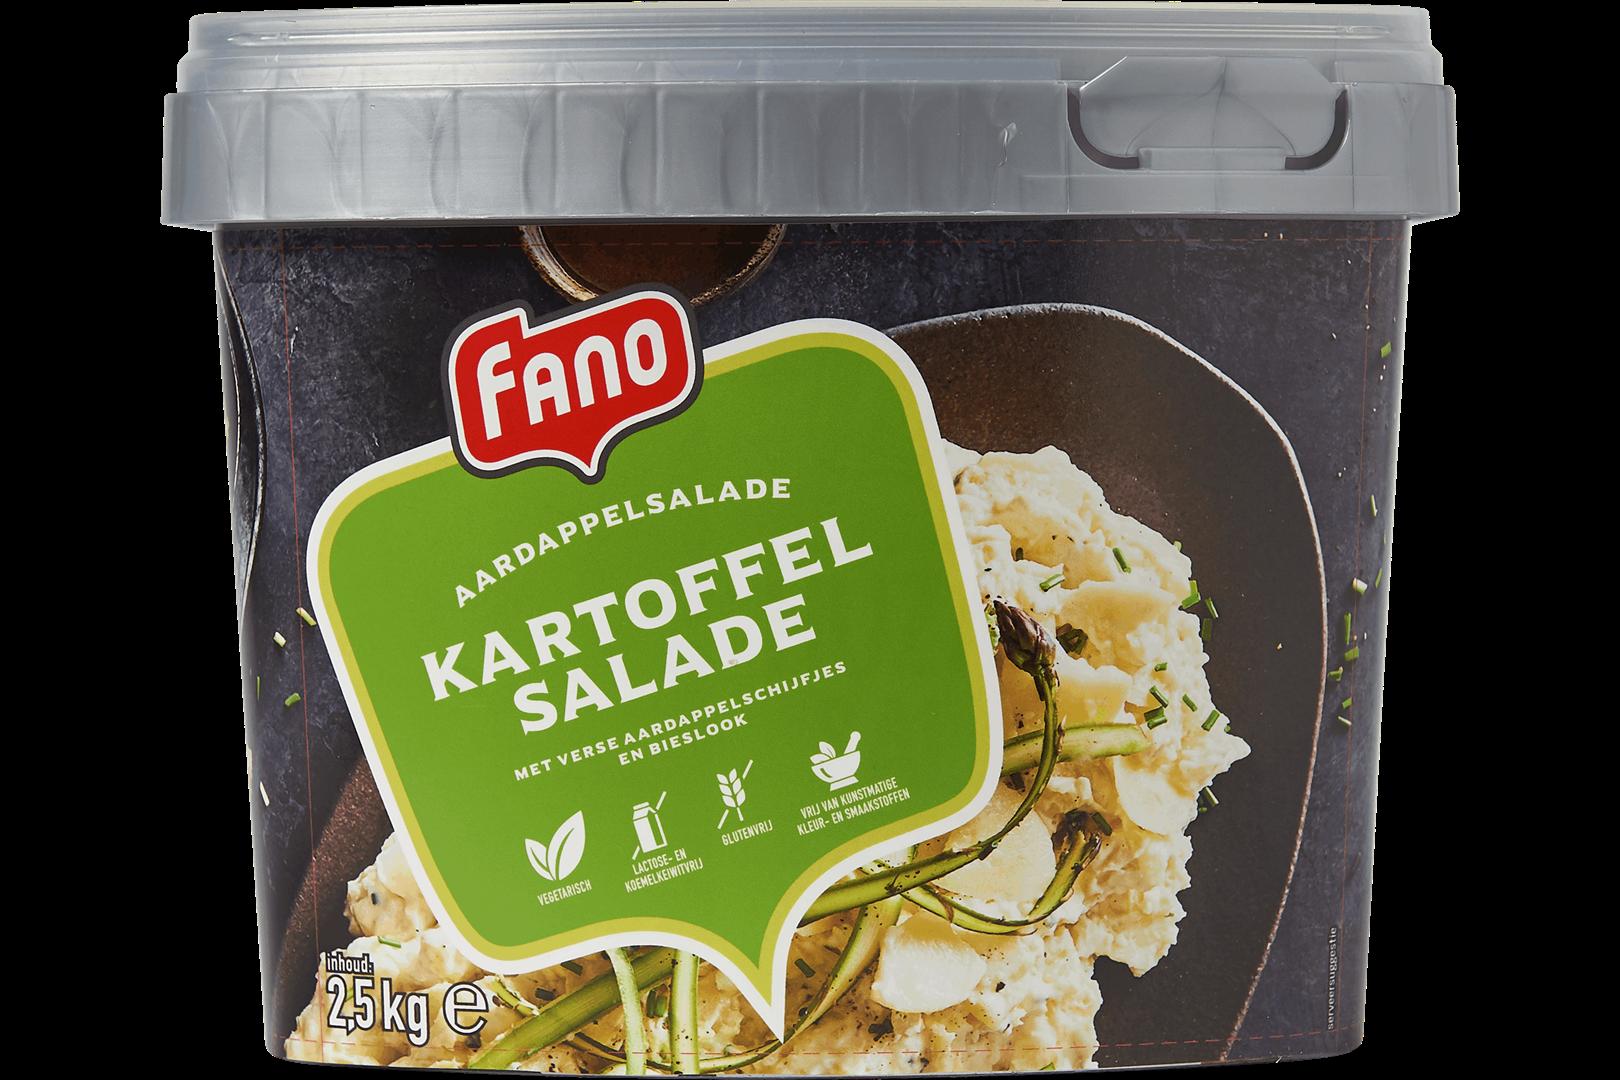 Productafbeelding FANO Kartoffel Salade 2,5kg